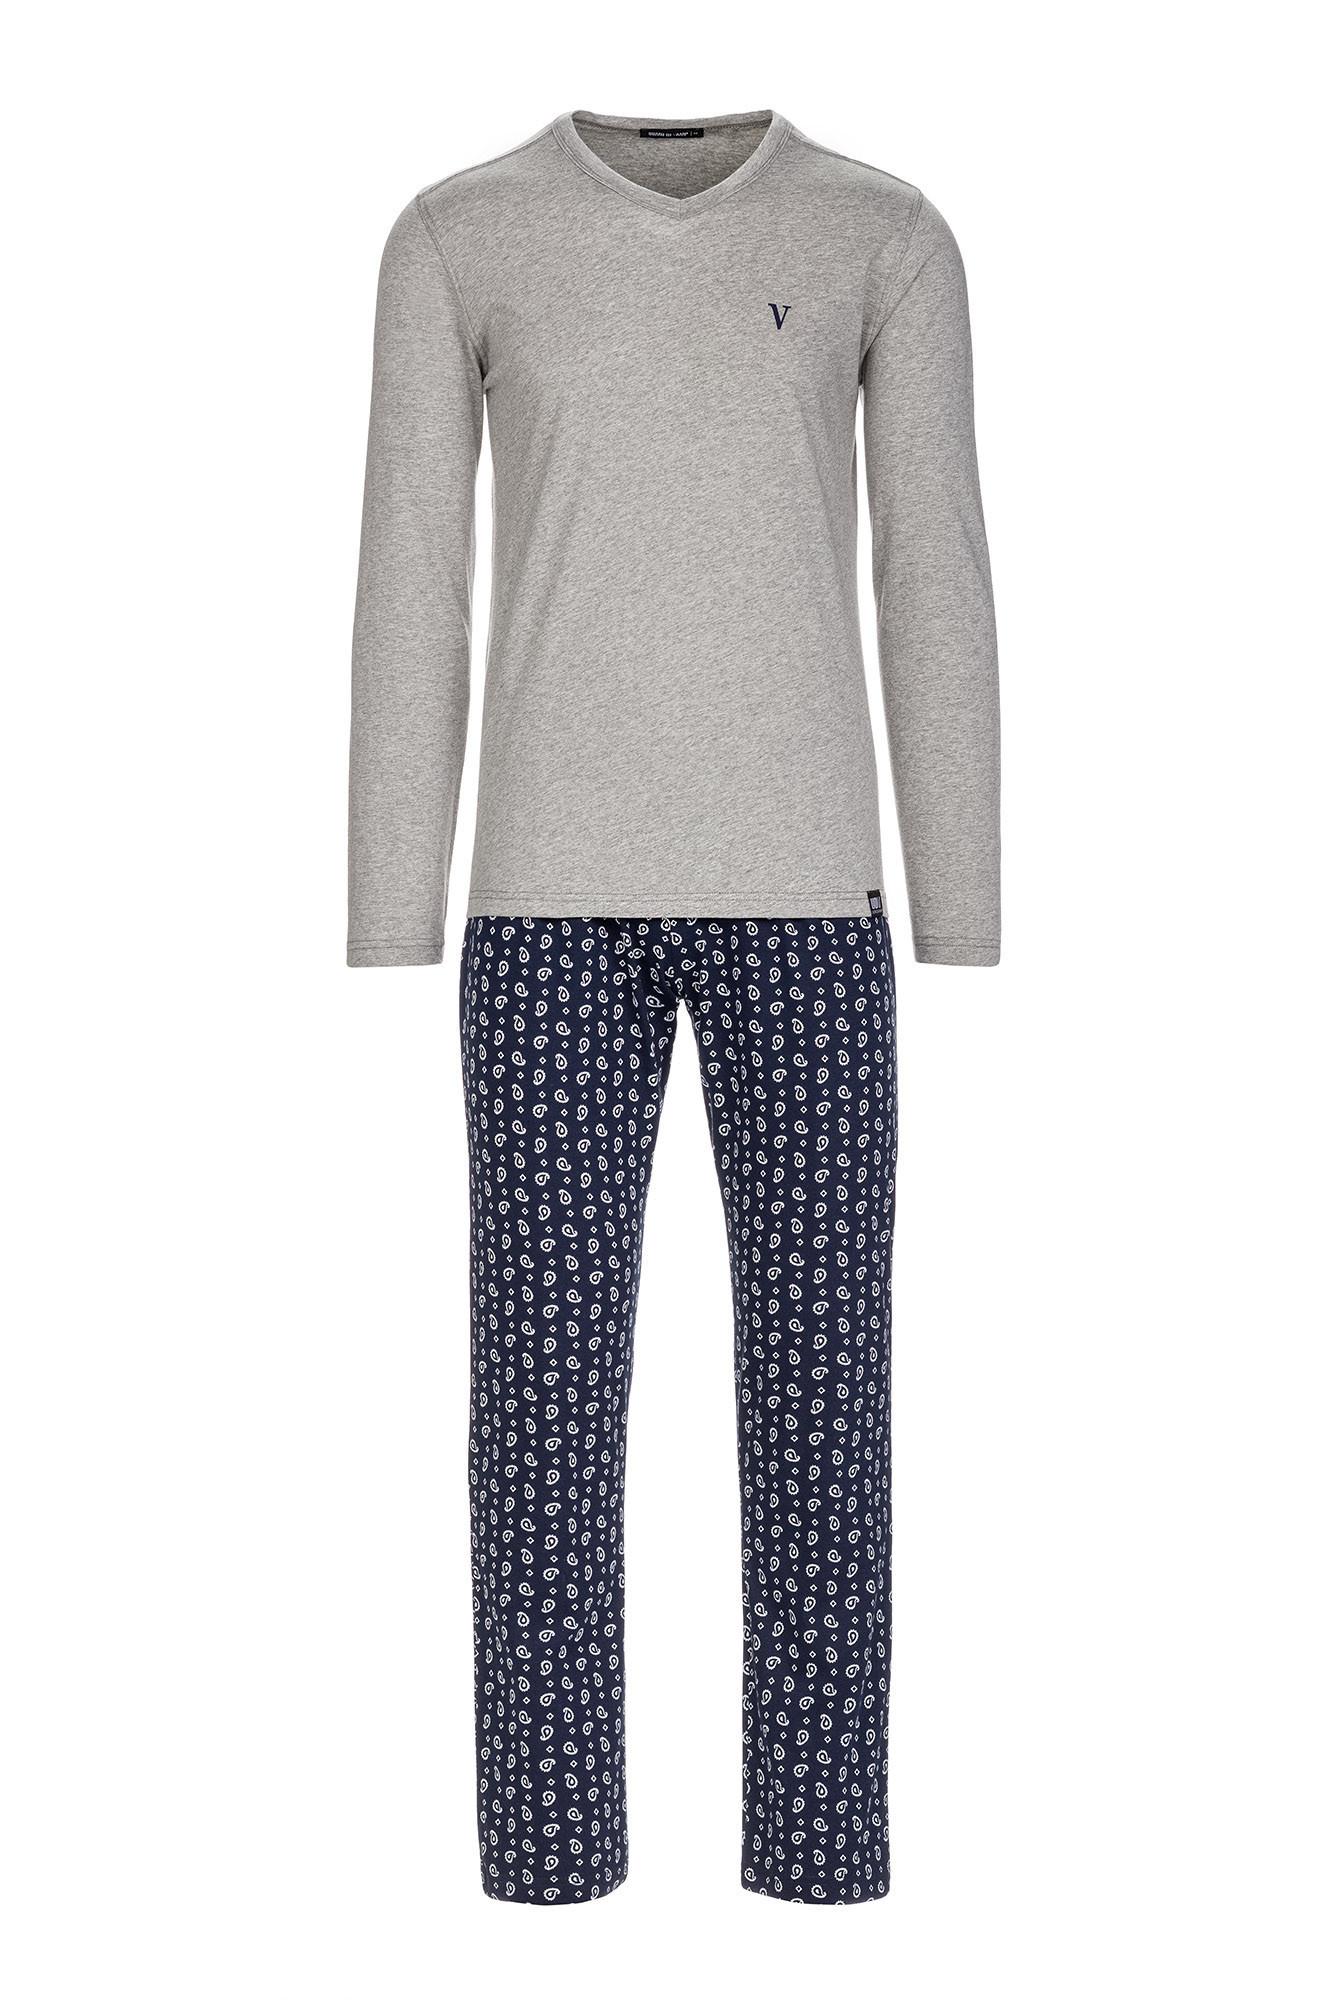 Vamp - Pohodlné pánske pyžamo 13655 - Vamp gray melange m